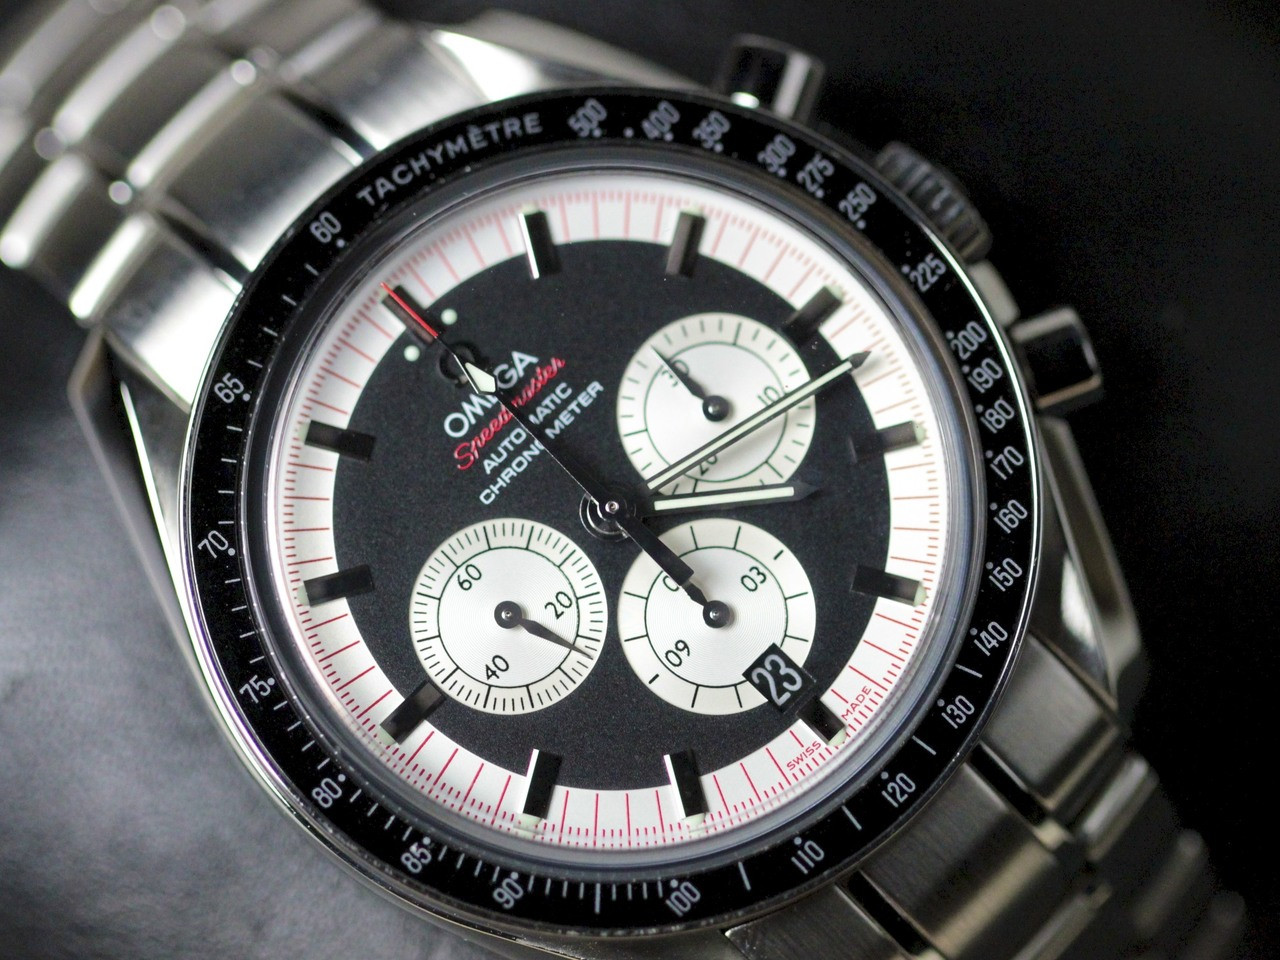 Omega Speedmaster Michael Schumacher The Legend Collection Price